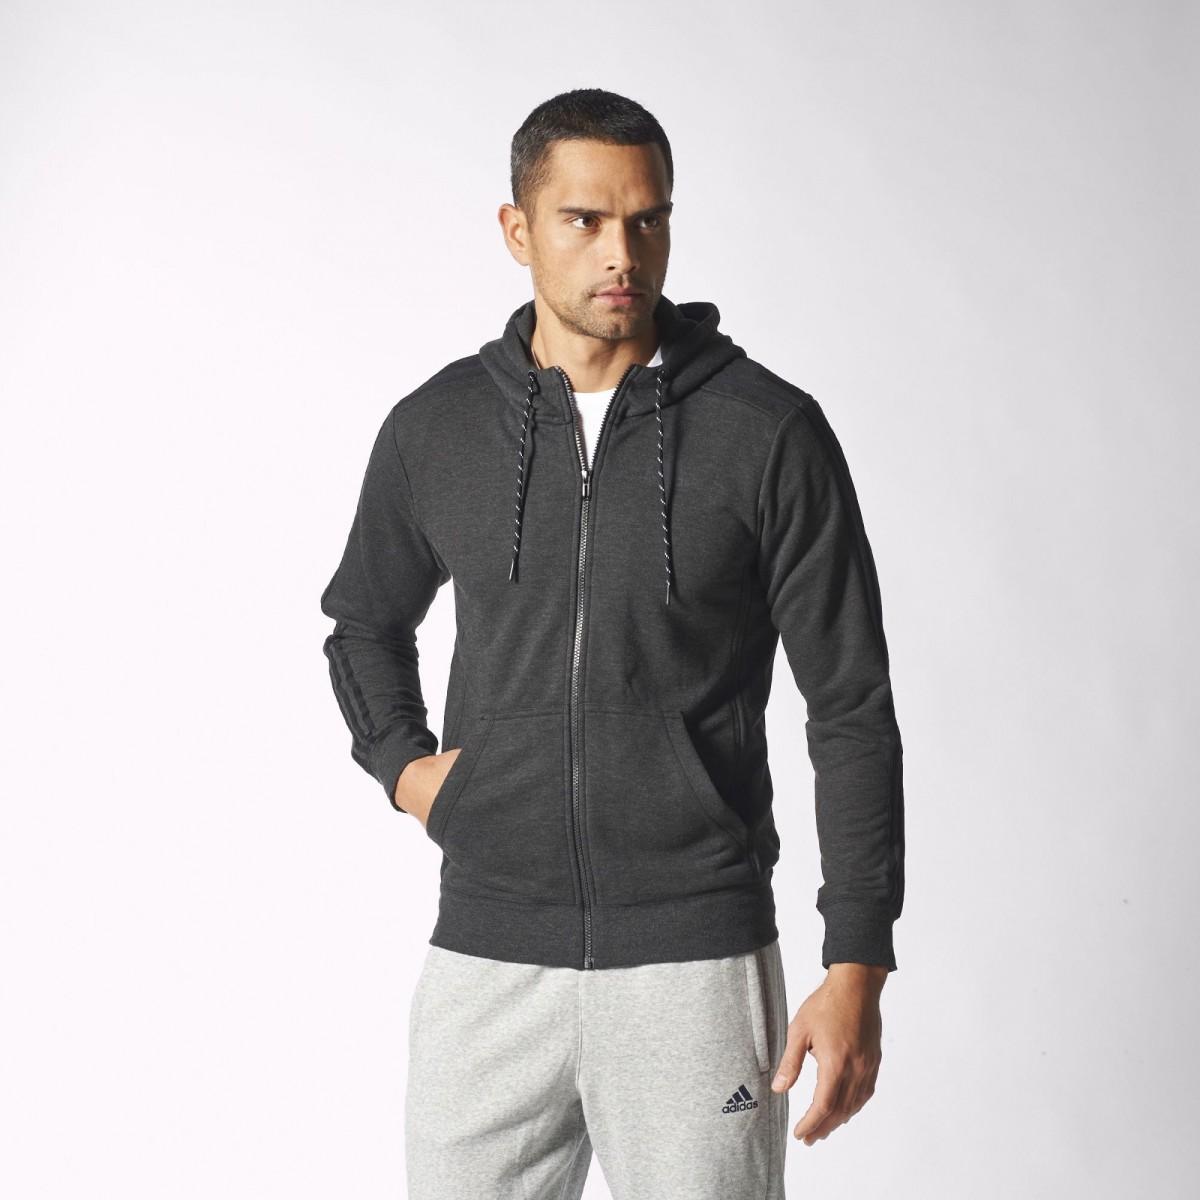 1d1a0c027f3 Bizz Store - Jaqueta Masculina Adidas Moletom Com Capuz Ess 3S